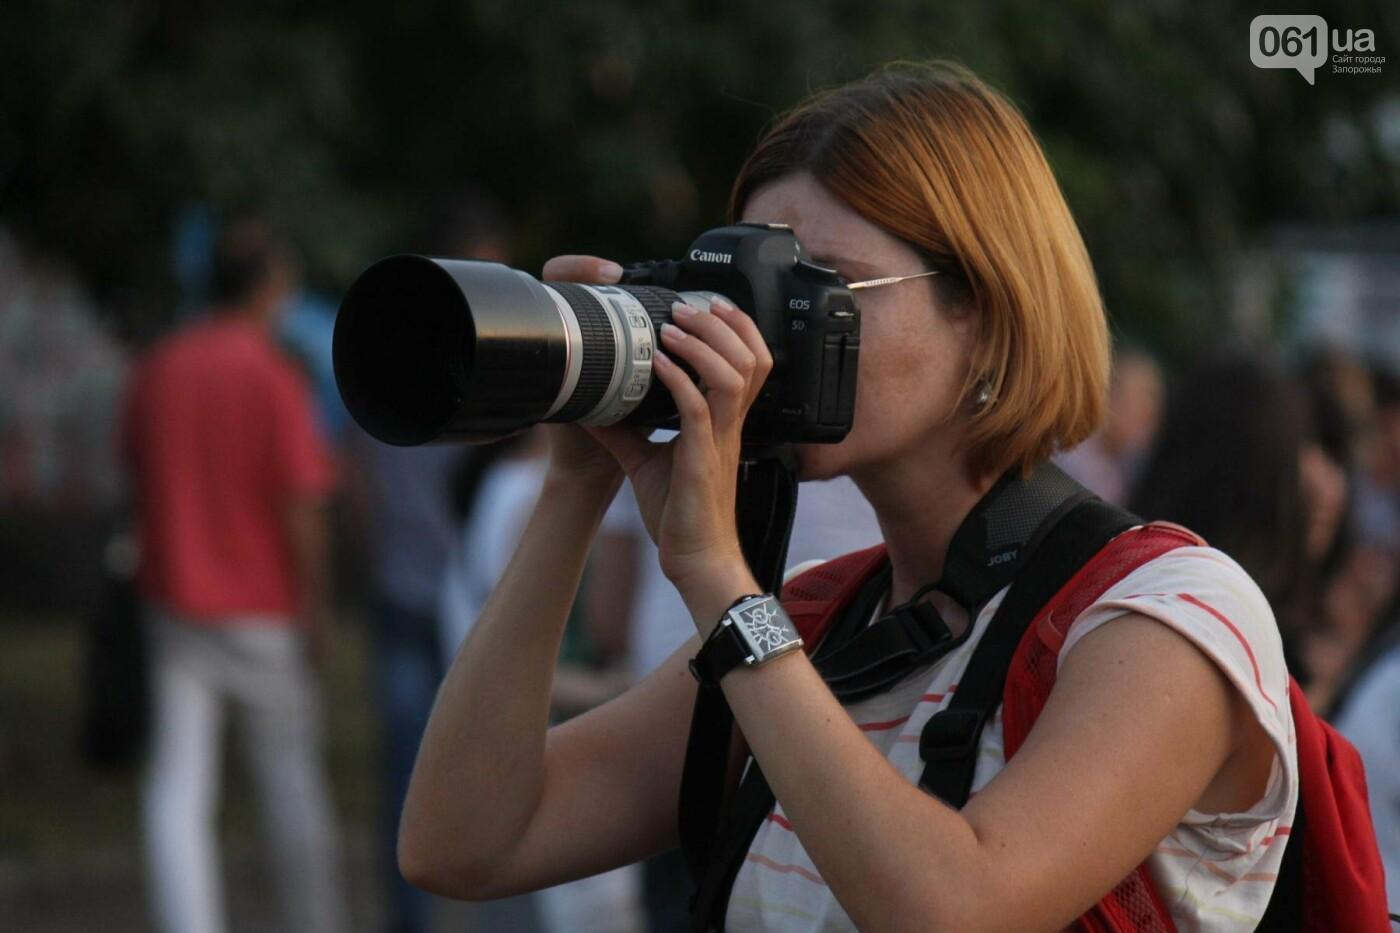 Найди себя: 50 портретов посетителей фестиваля Khortytsia Freedom, – ФОТОРЕПОРТАЖ, фото-24